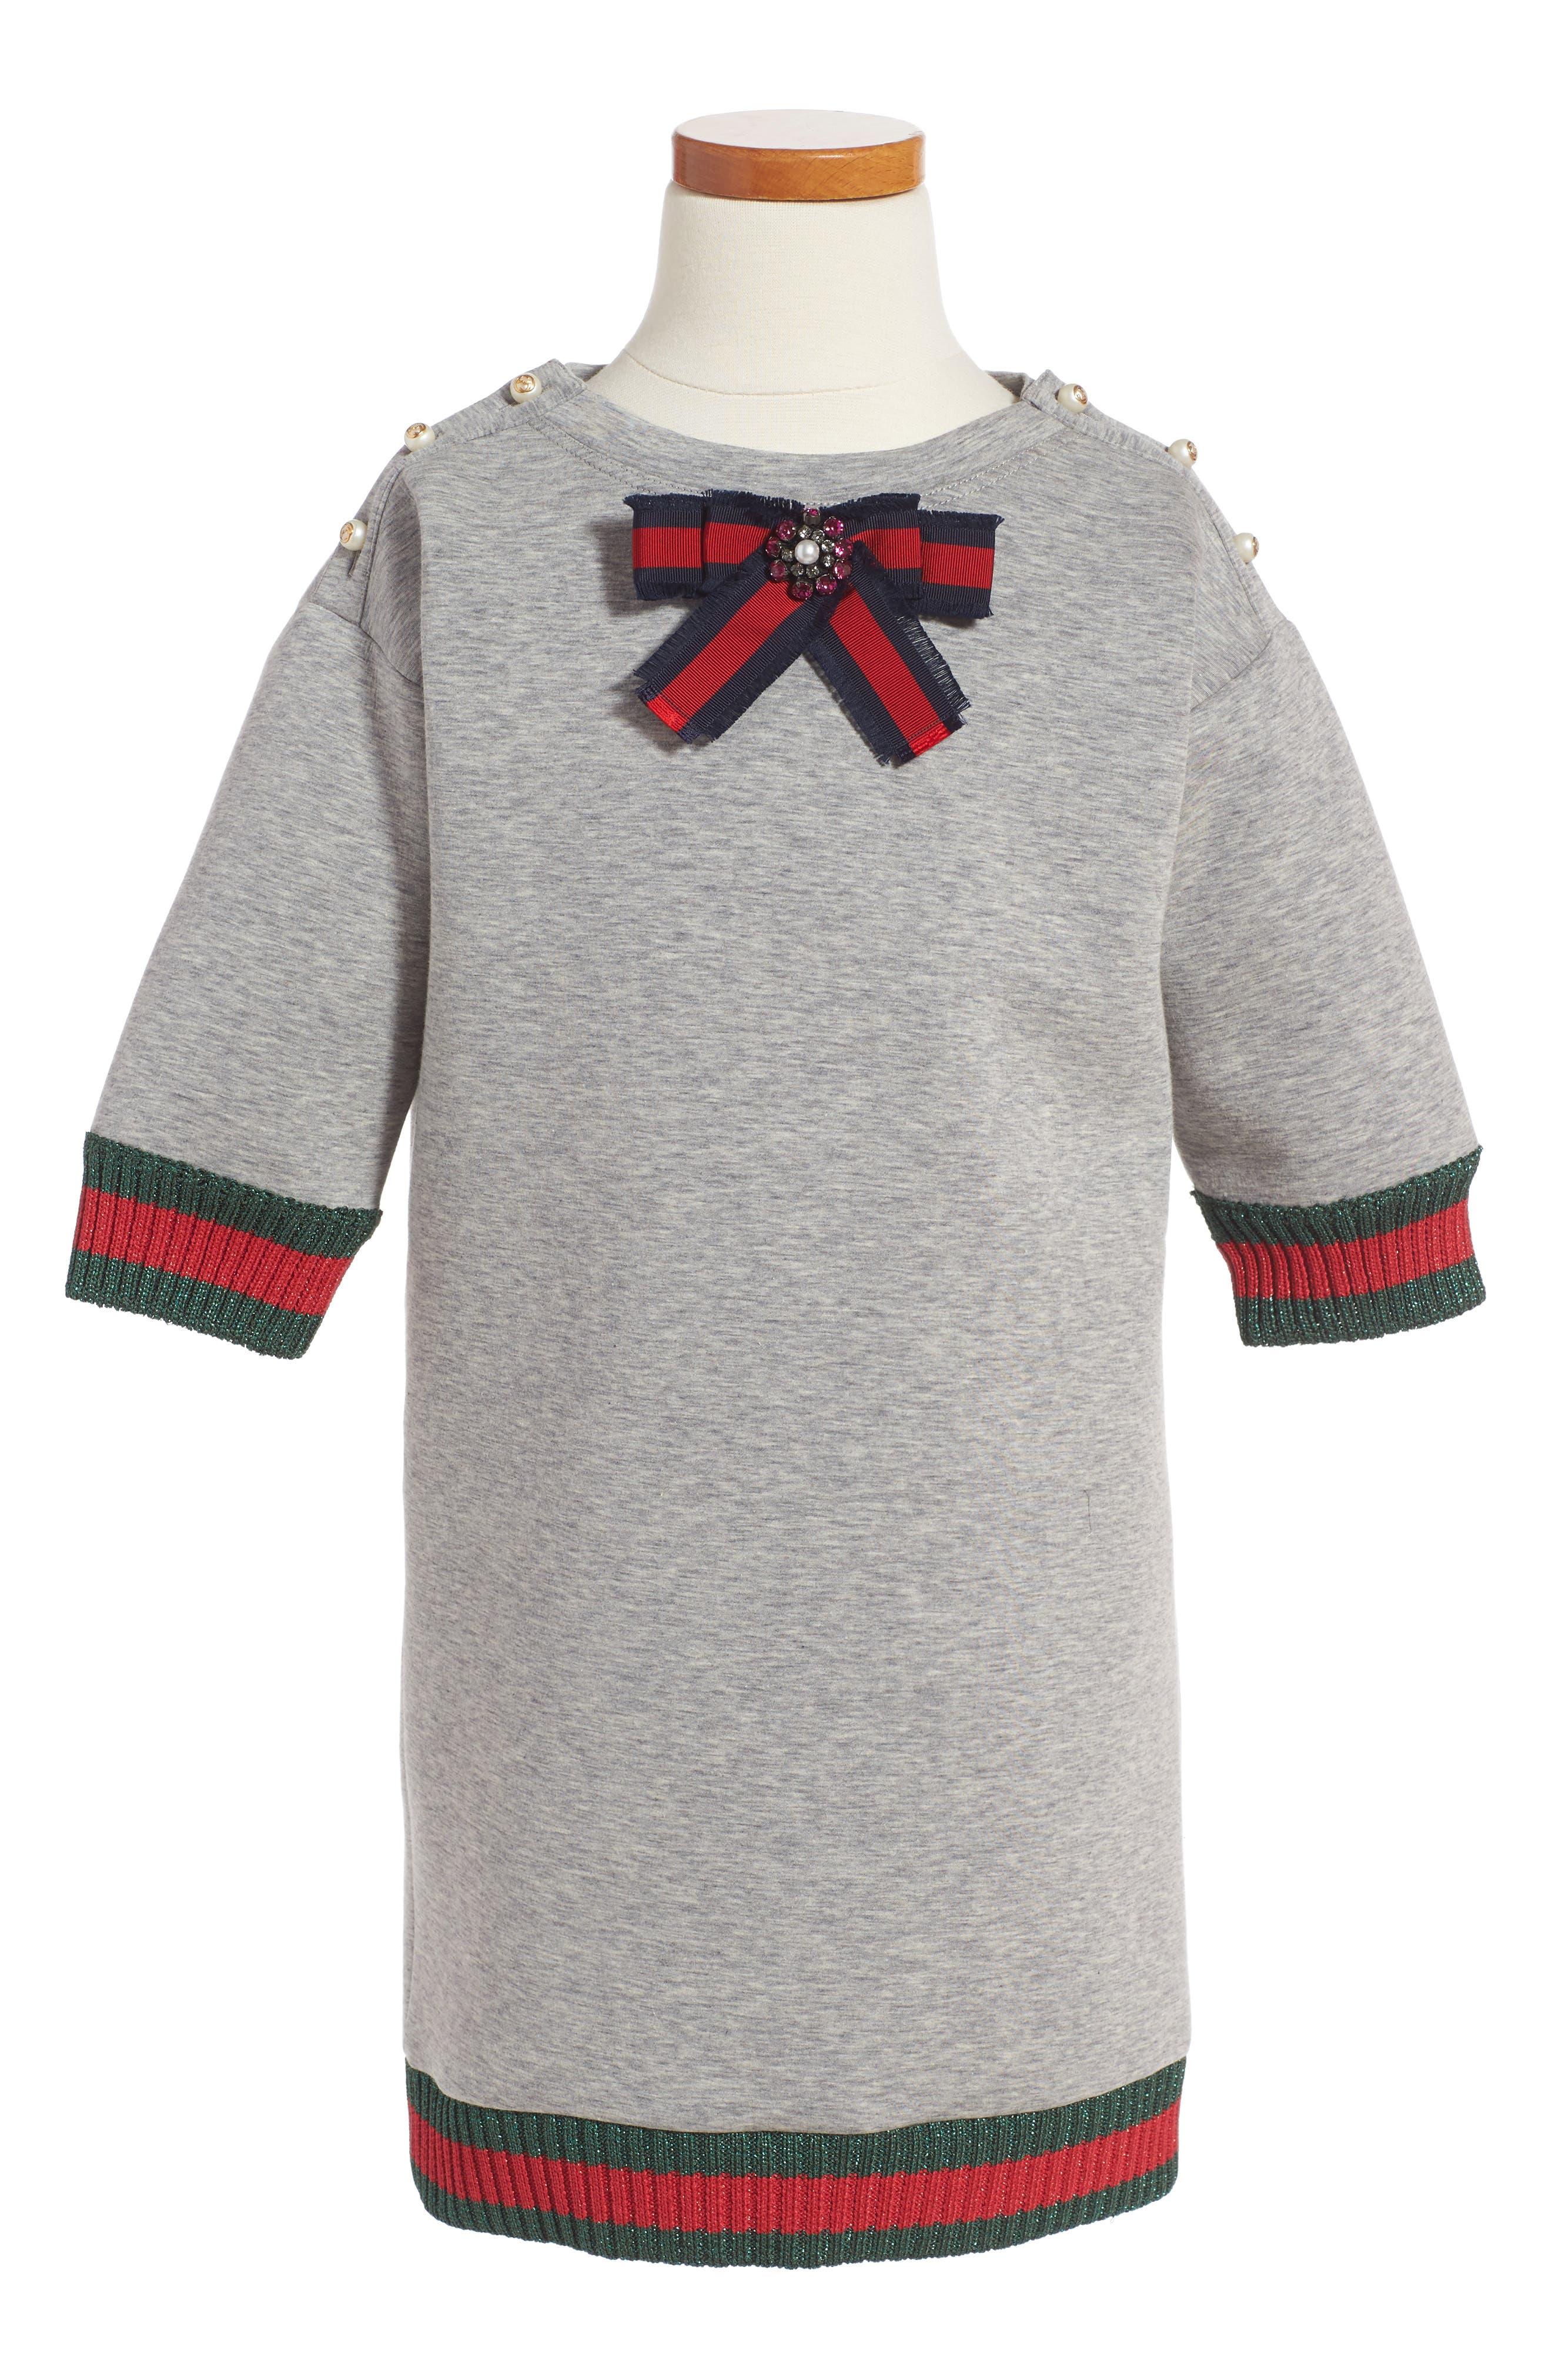 Main Image - Gucci Bow Sweater (Little Girls & Big Girls)